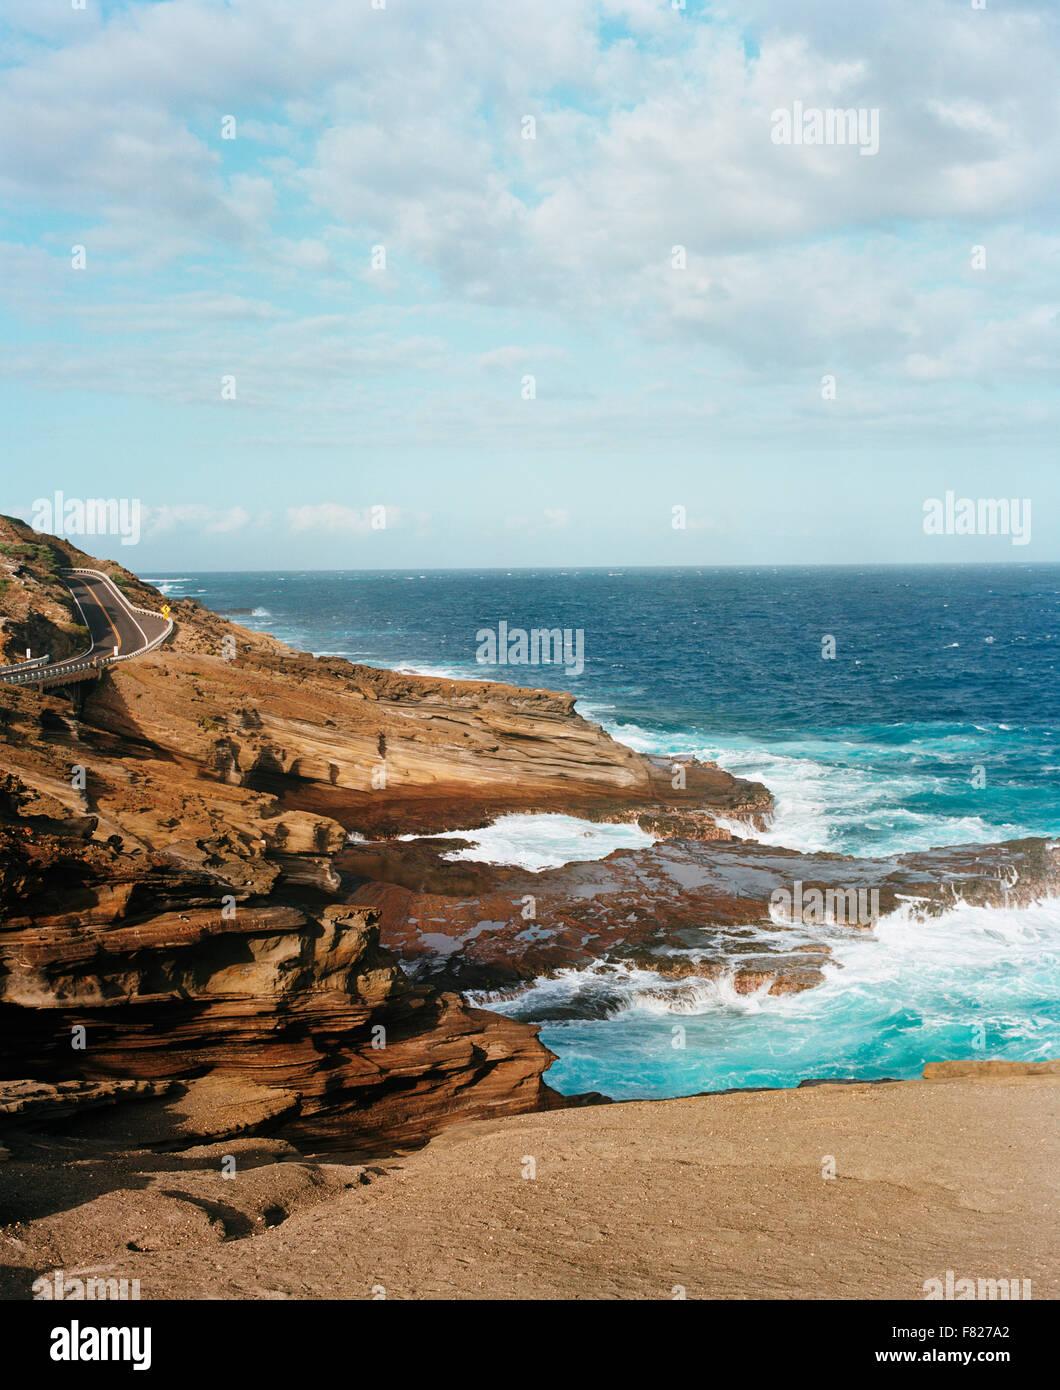 Coastal landscape in Hawaii - Stock Image